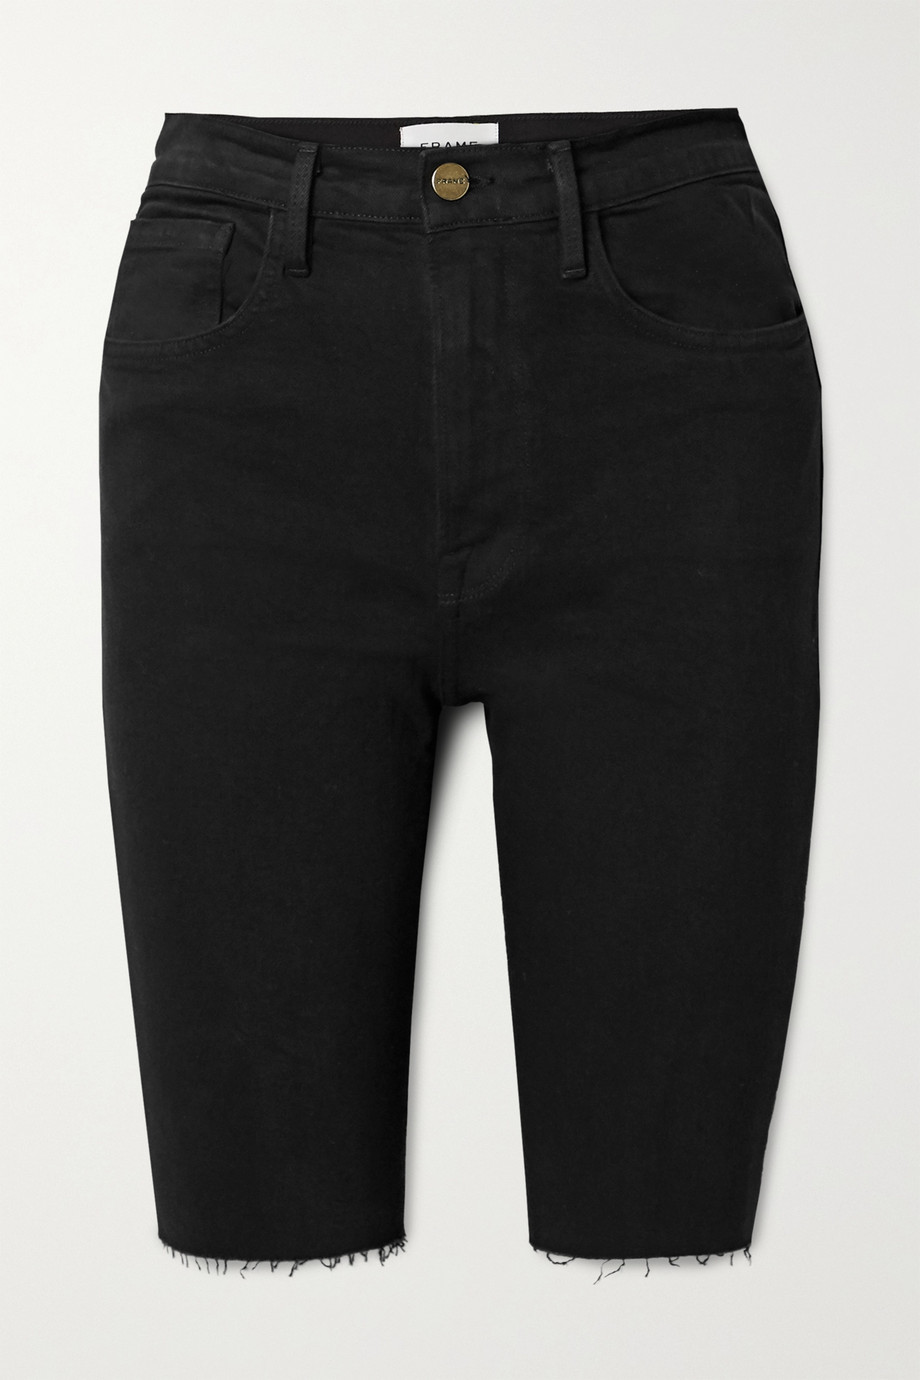 FRAME Le Vintage Bermuda 毛边牛仔短裤